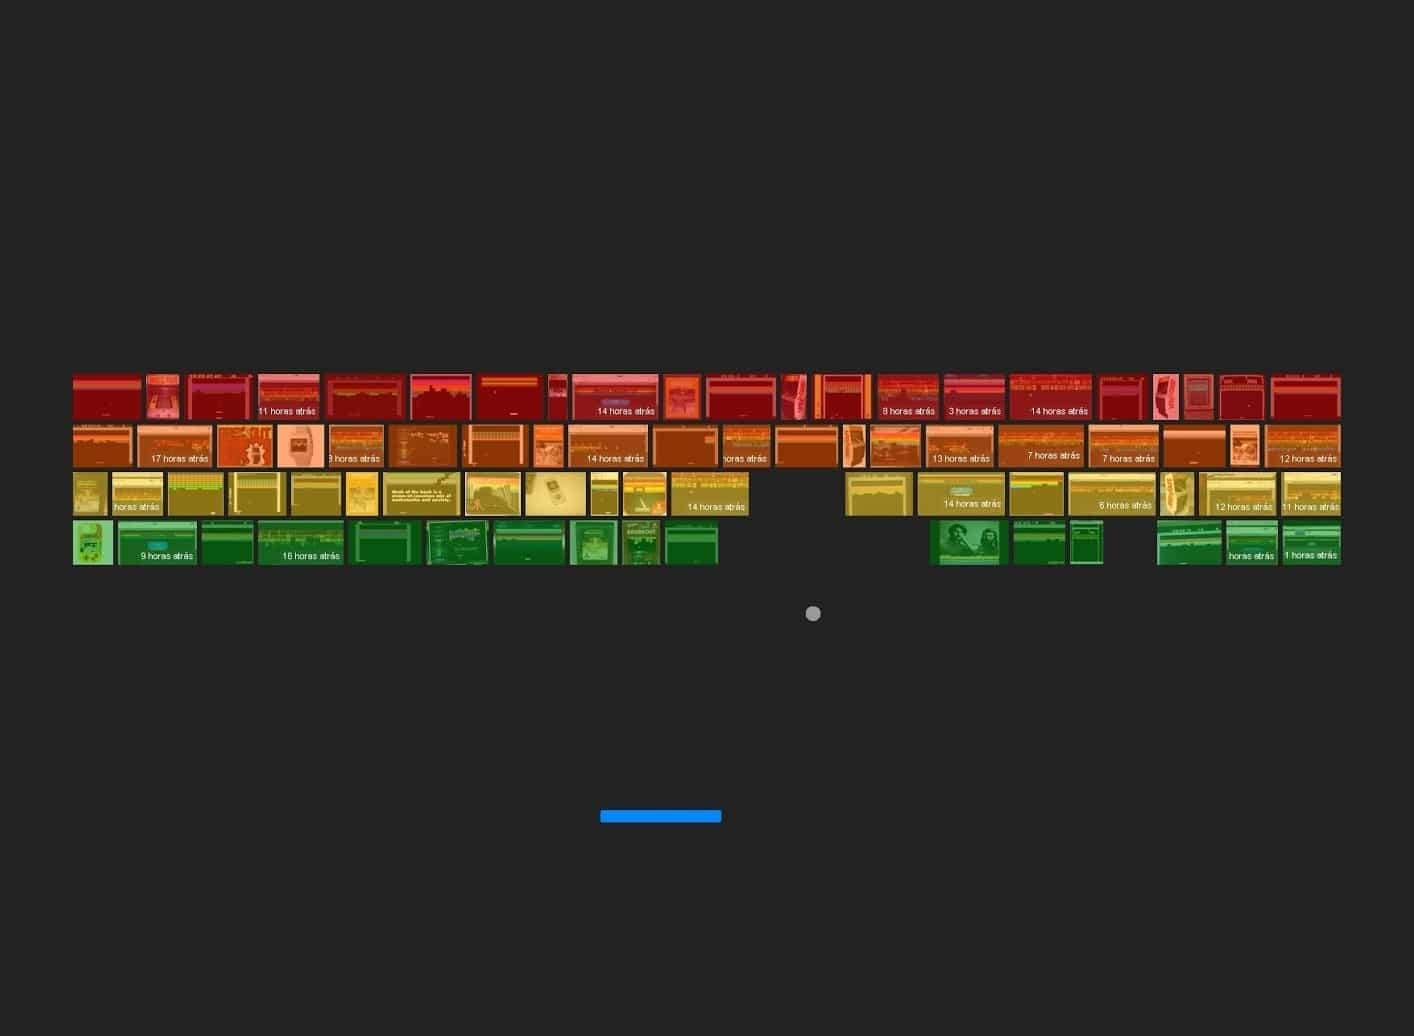 Atari Breakout: Jogar Online no Google! Saiba como!